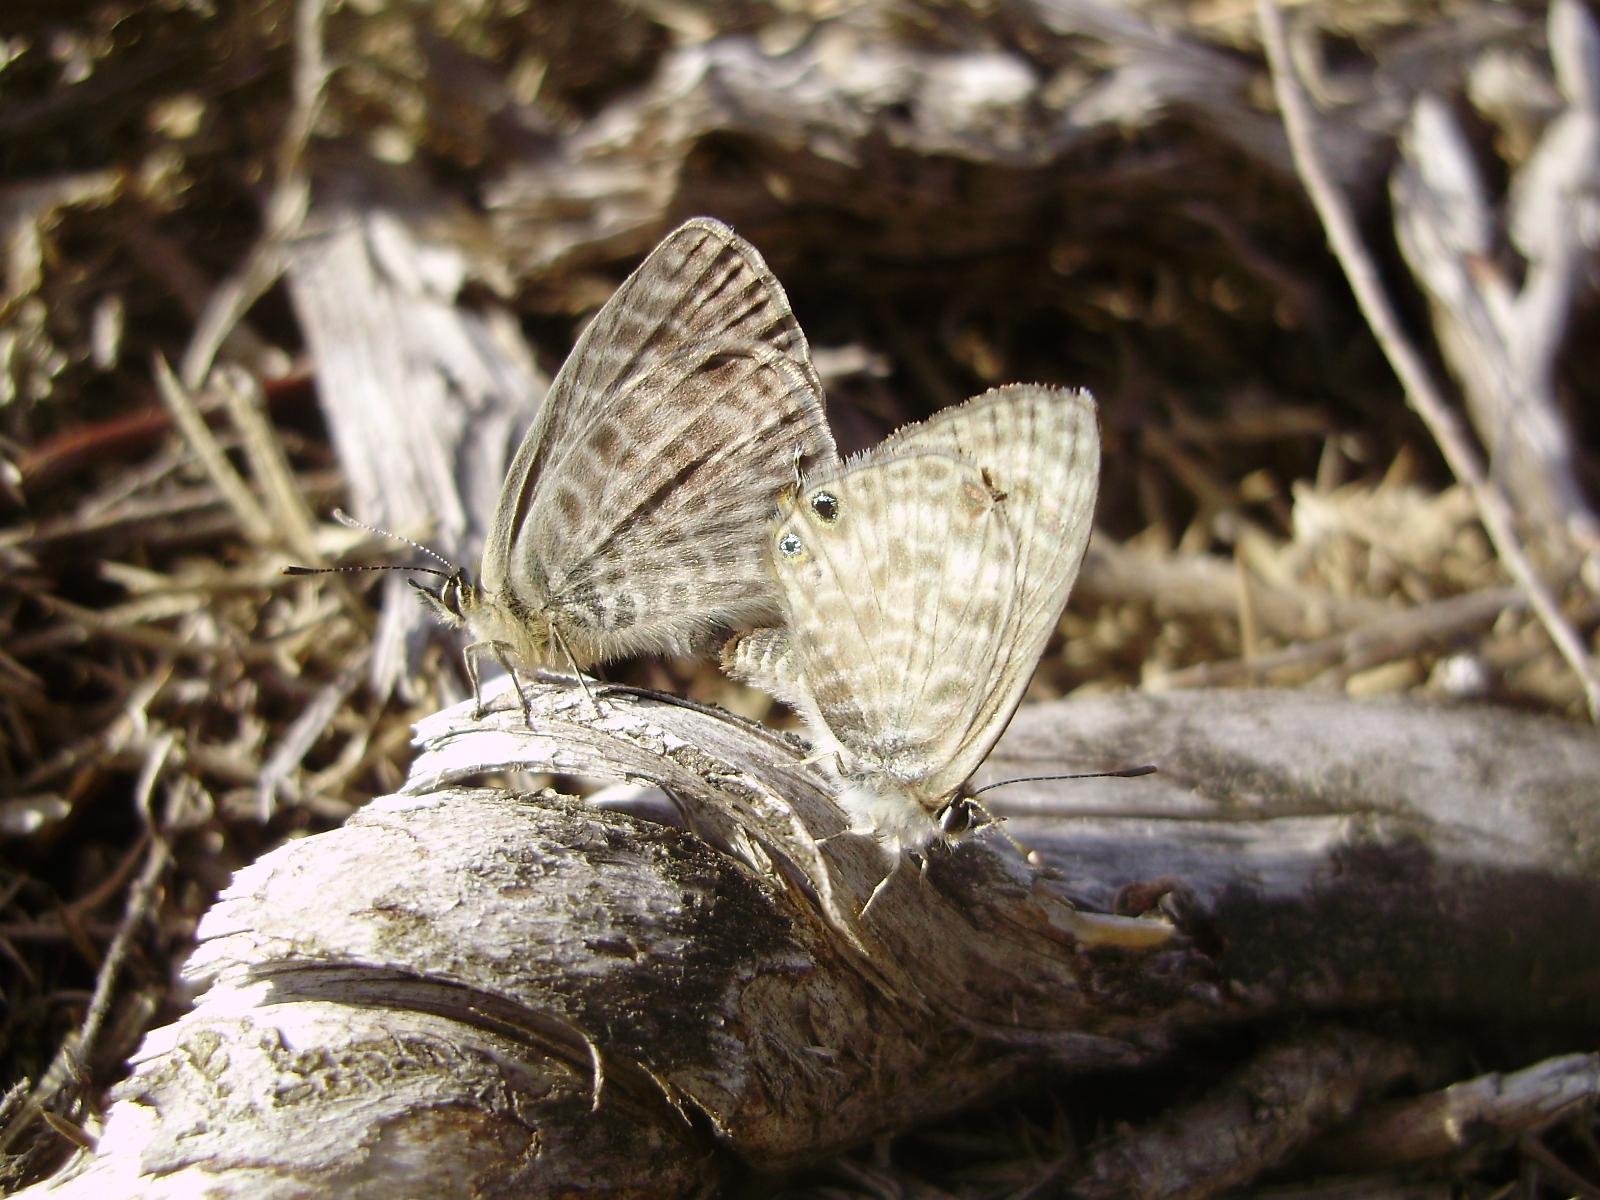 Pareja de mariposas Leptotes pirithous en copula